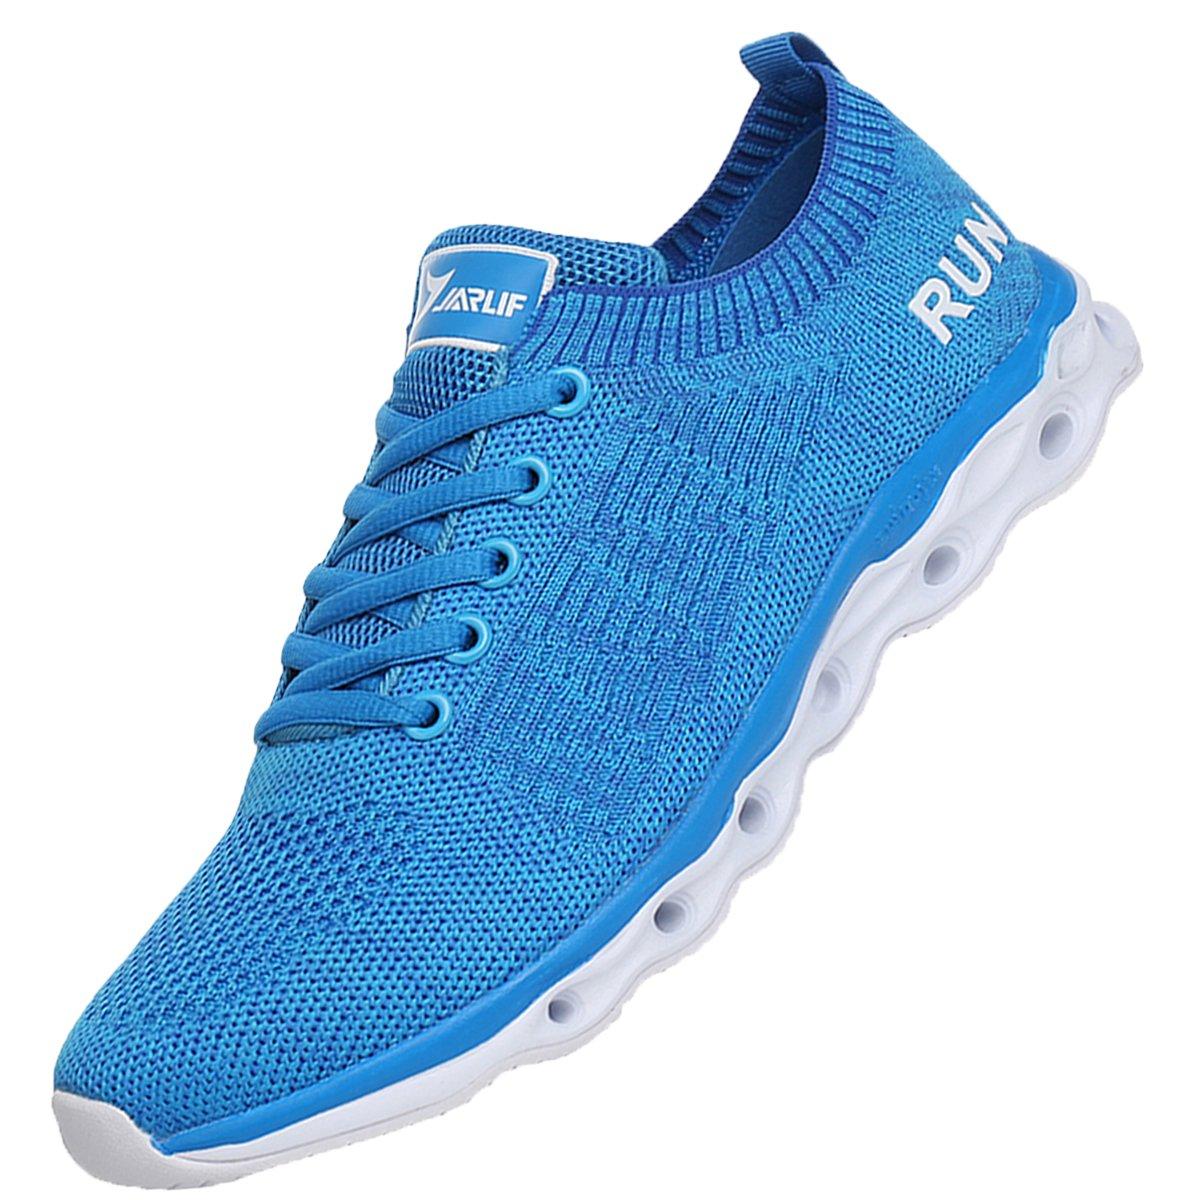 JARLIF Women's Lightweight Fashion Walking Sneakers Athletic Tennis Running Shoes (8.5 B(M), Blue)